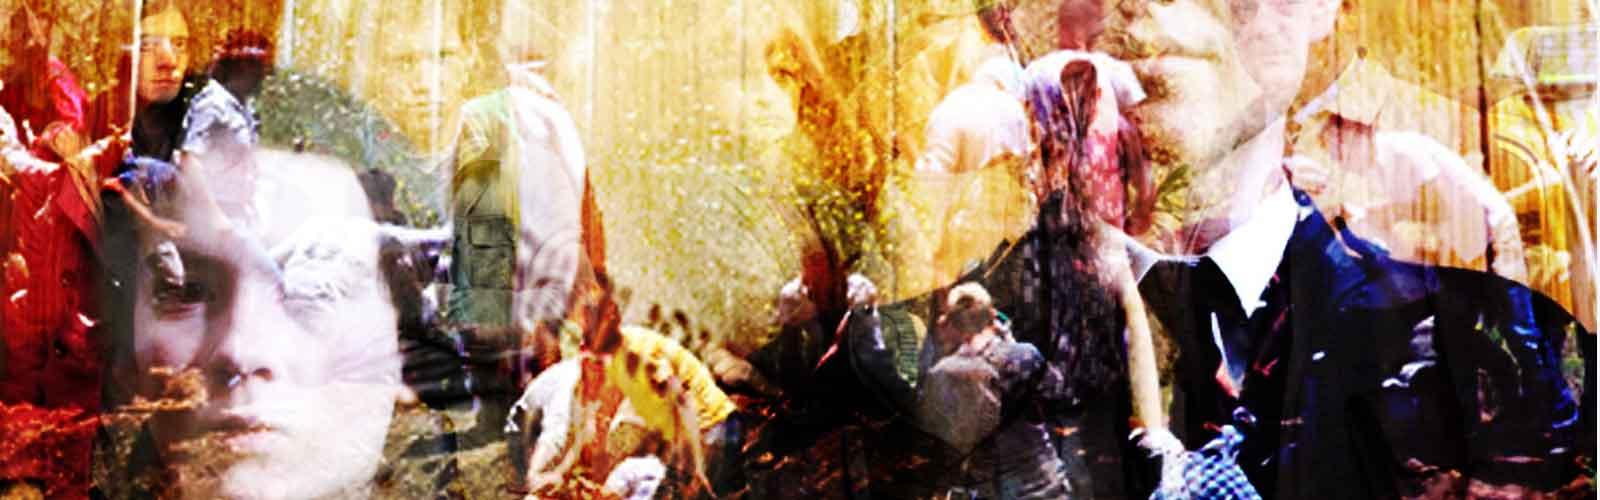 20110605serie_dosis02